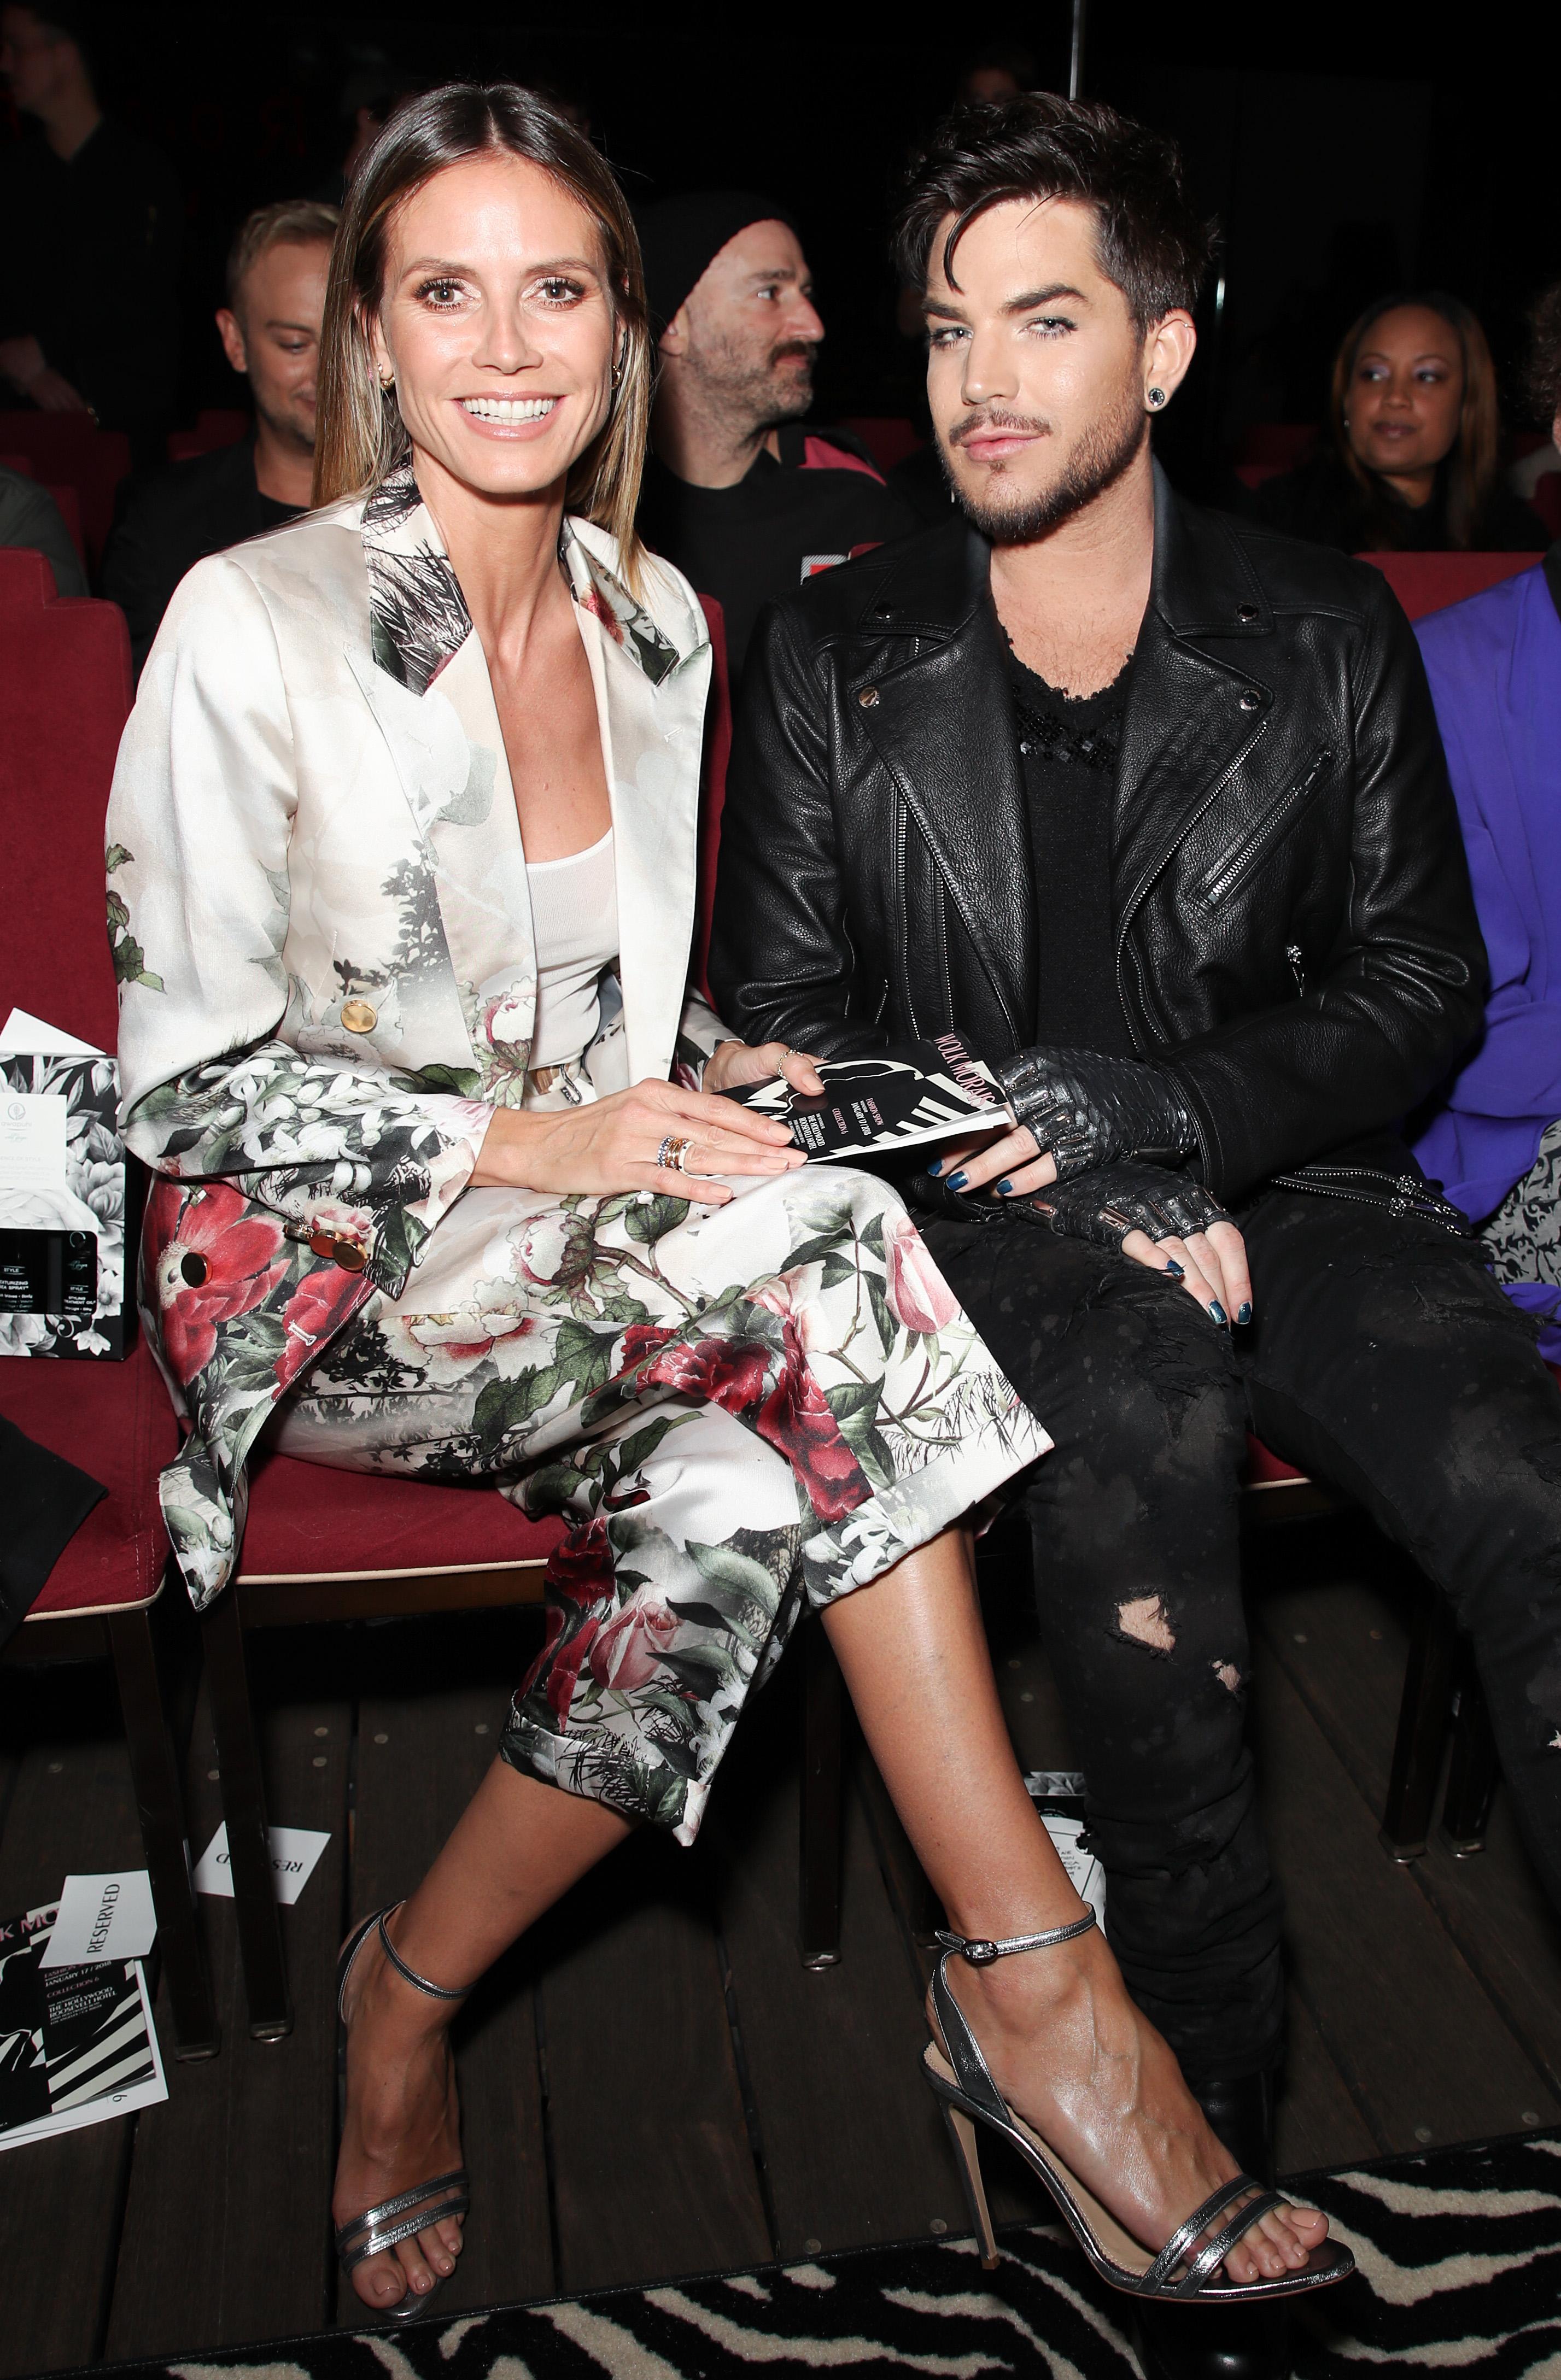 Heidi Klum and Adam Lambert Wolk Morais Collection 6 show, Front Row, Los Angeles, USA - 17 Jan 2018